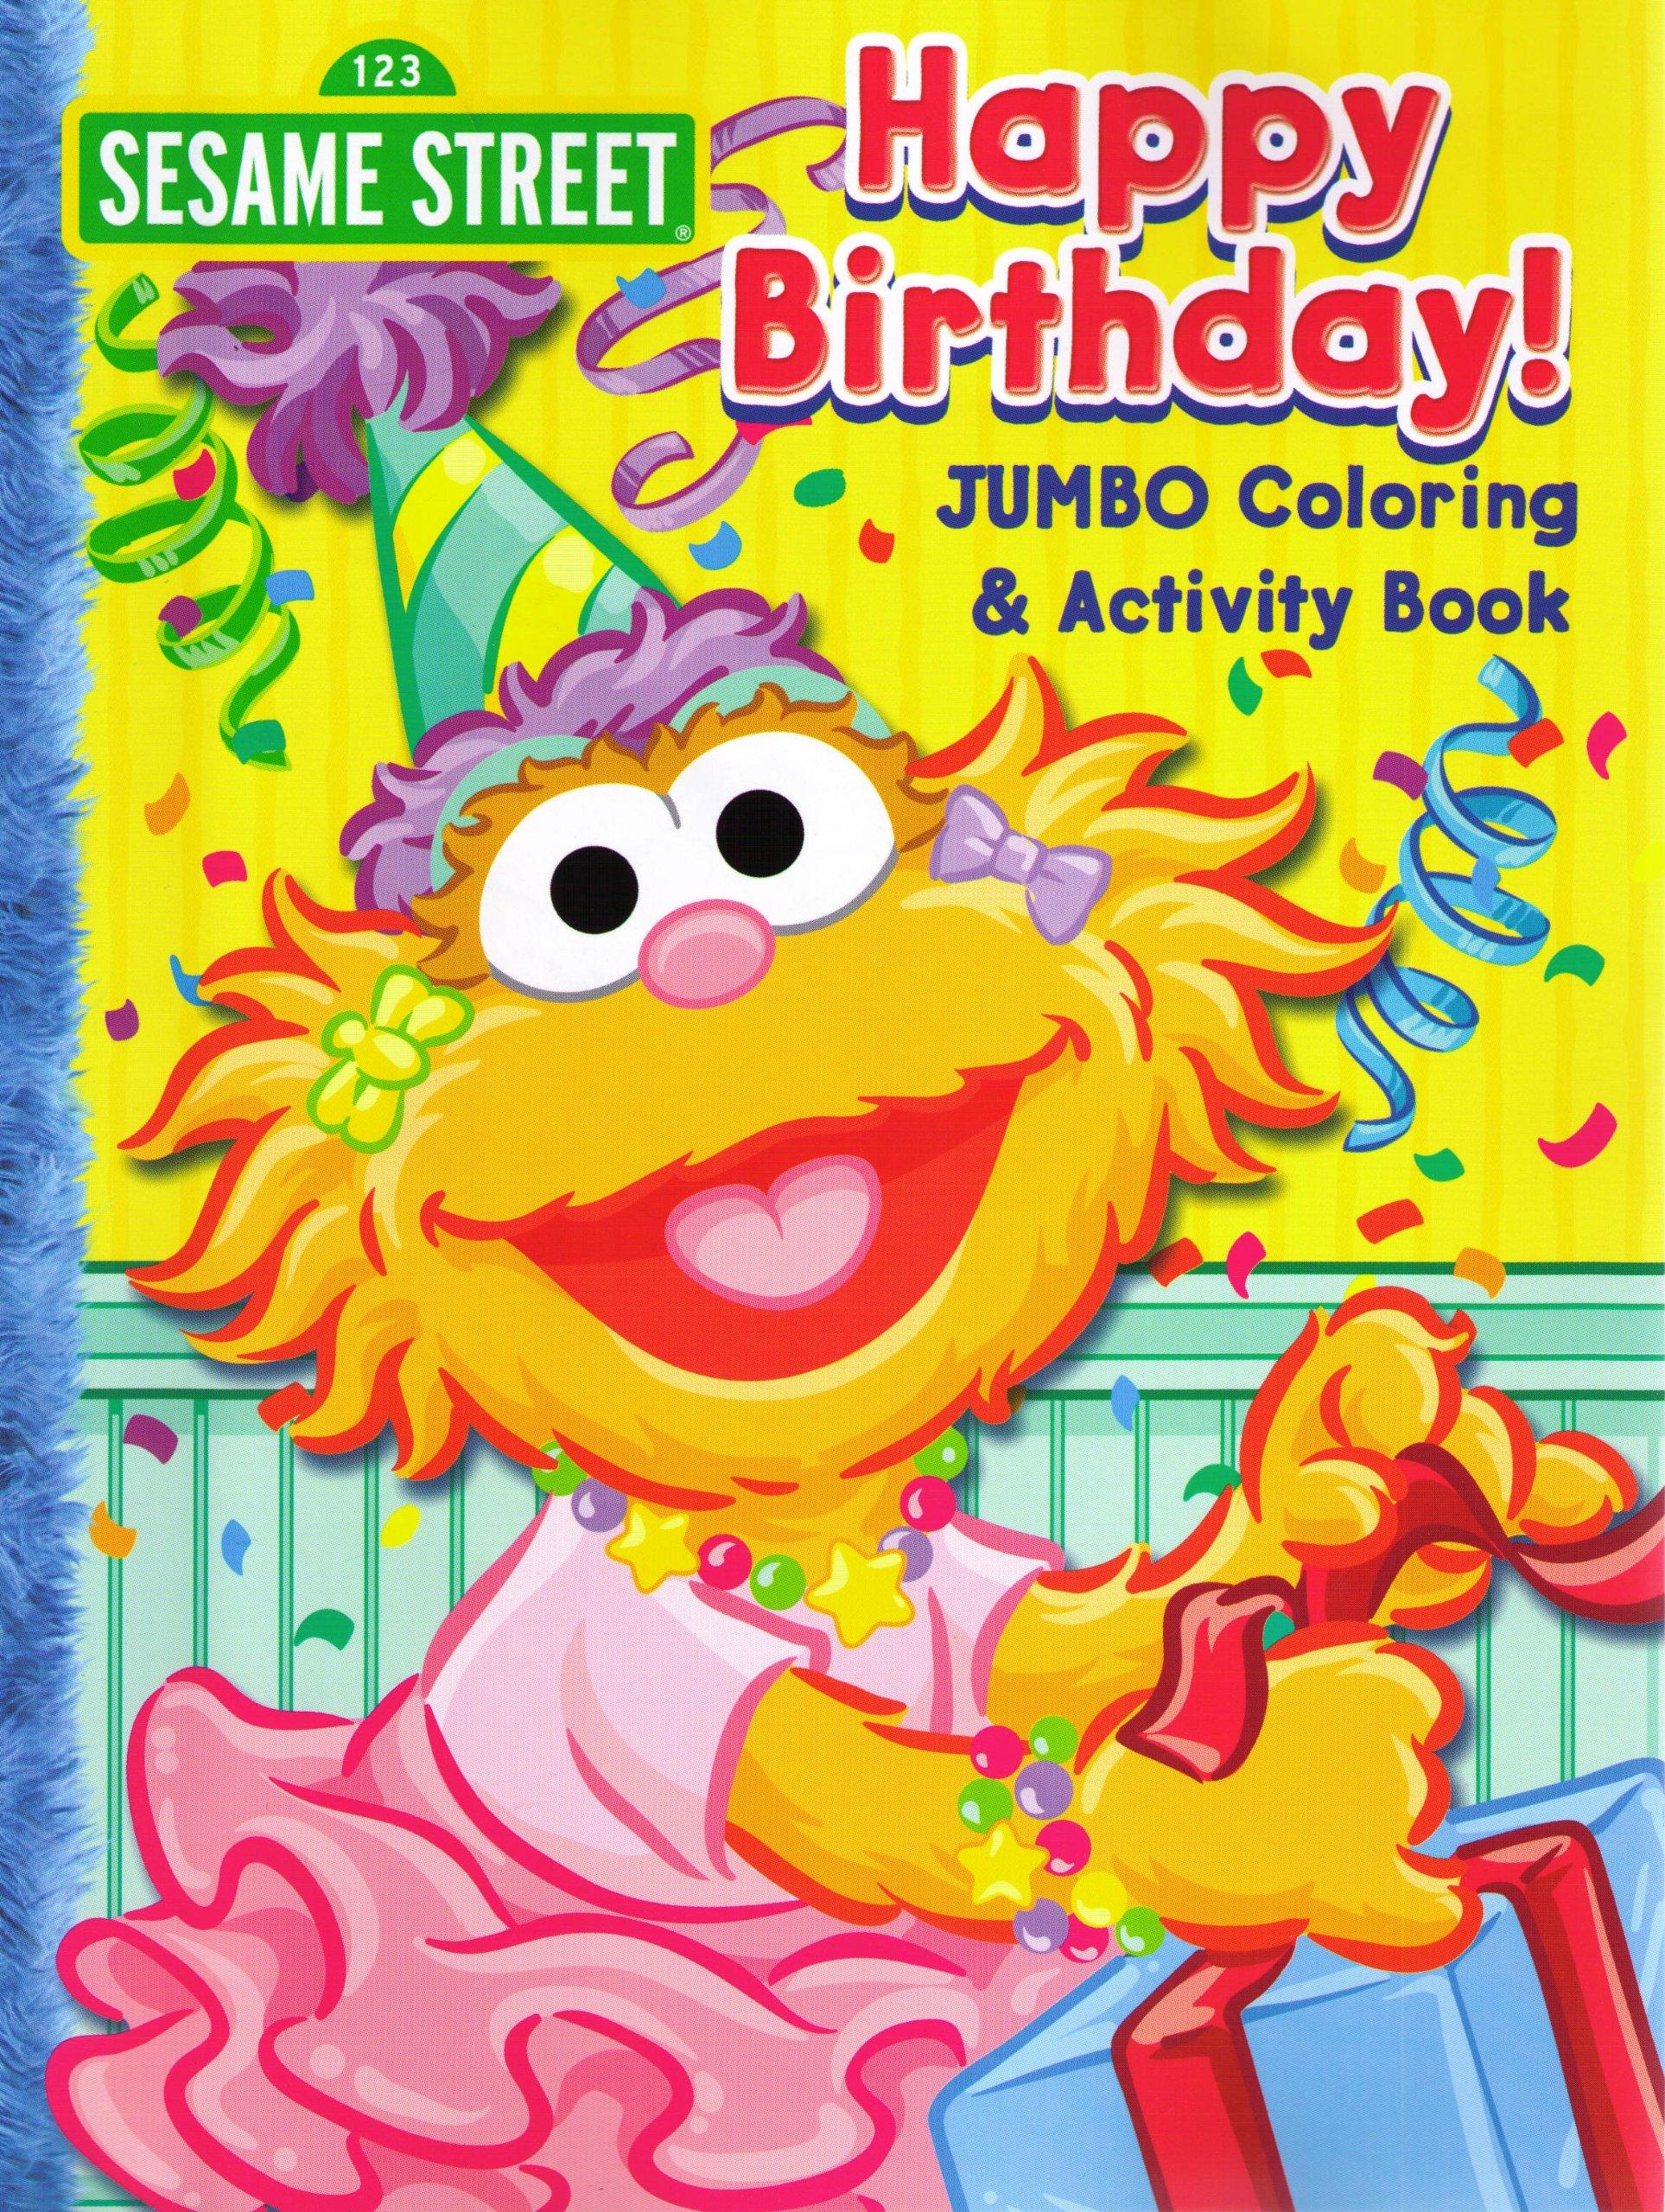 Sesame Street Jumbo Coloring & Activity Book Happy Birthday ...